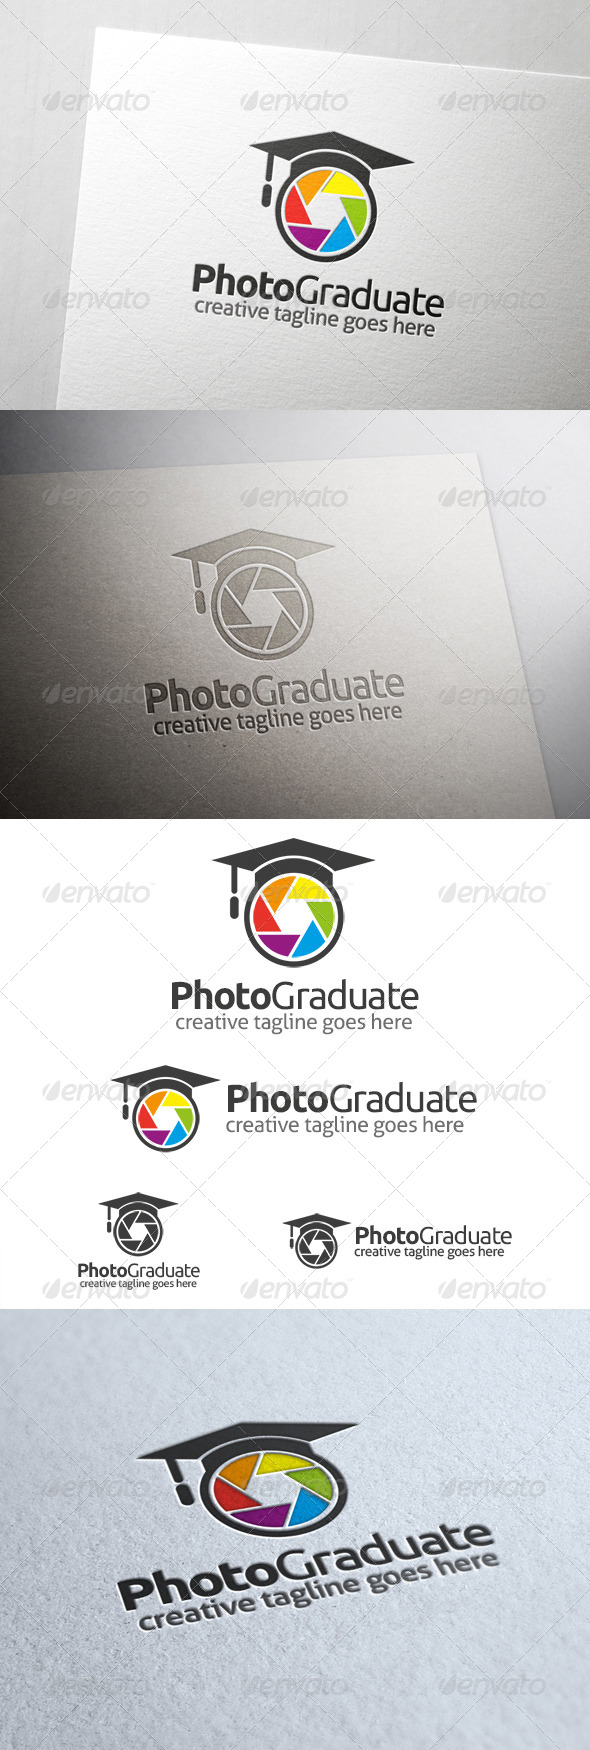 Photo Graduate Logo - Symbols Logo Templates